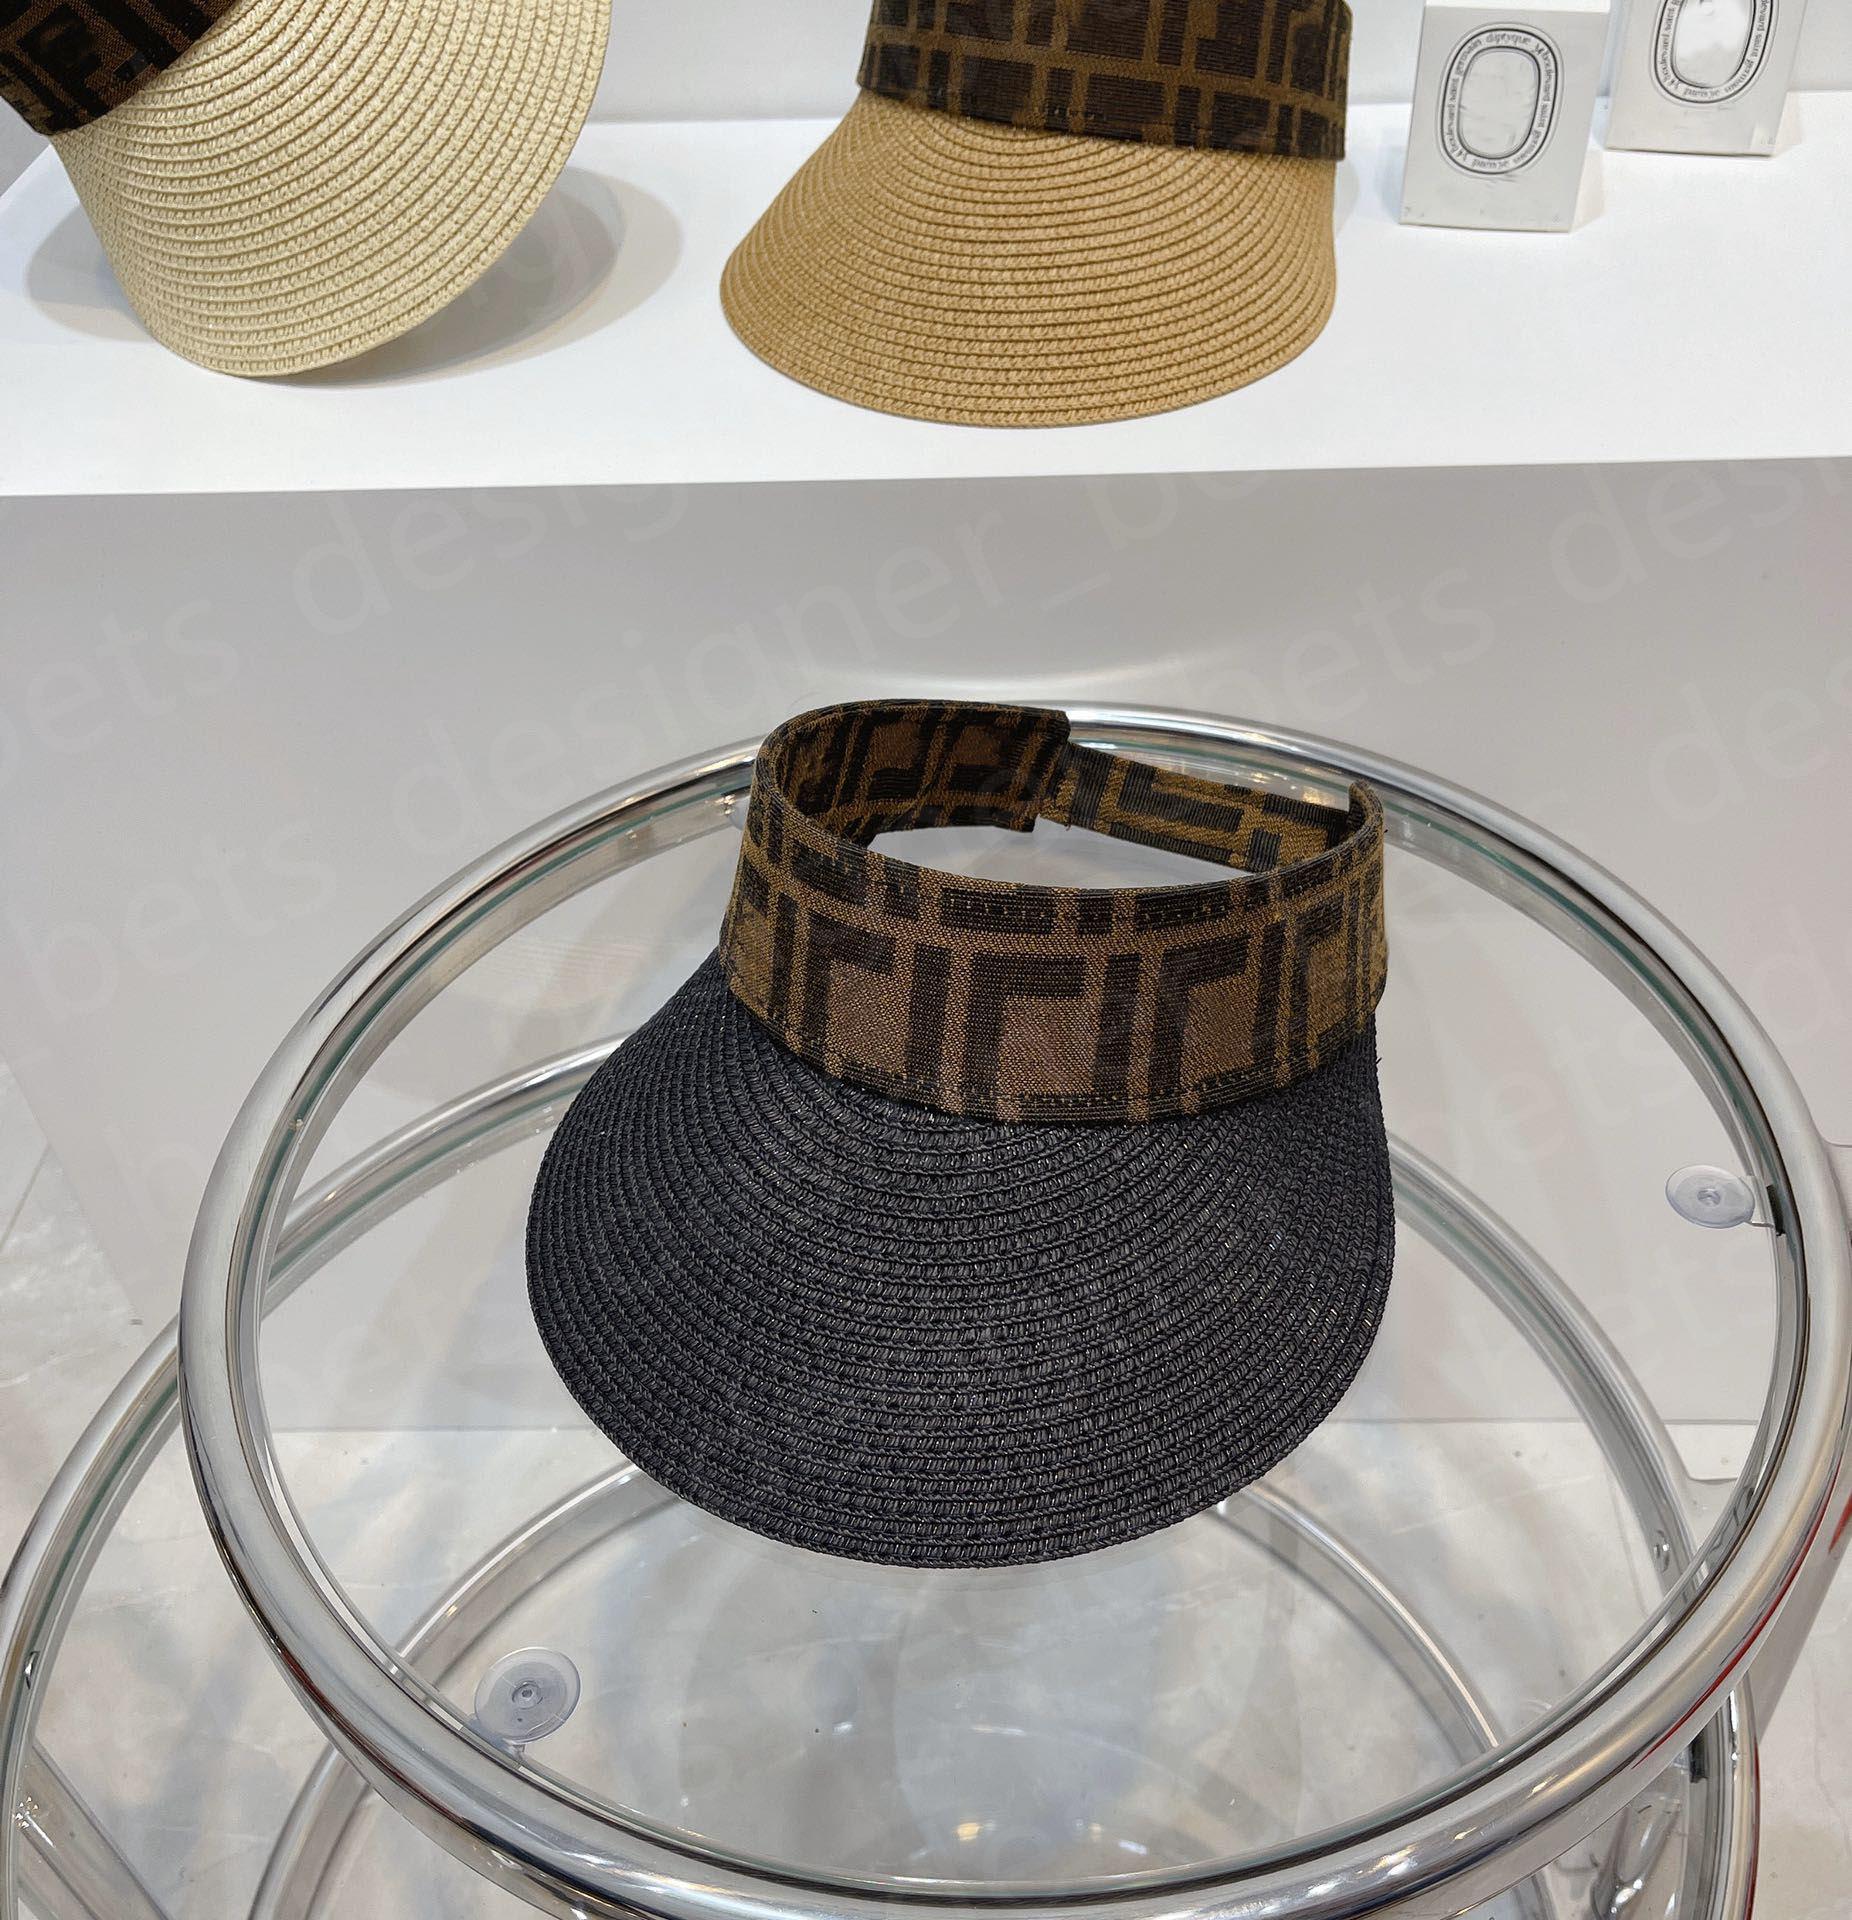 2021 Casual Summer Visor Sun men design 3 color Sports Hat mens women Golf Tennis Outdoor Beach Headband Snapback Baseball Hats